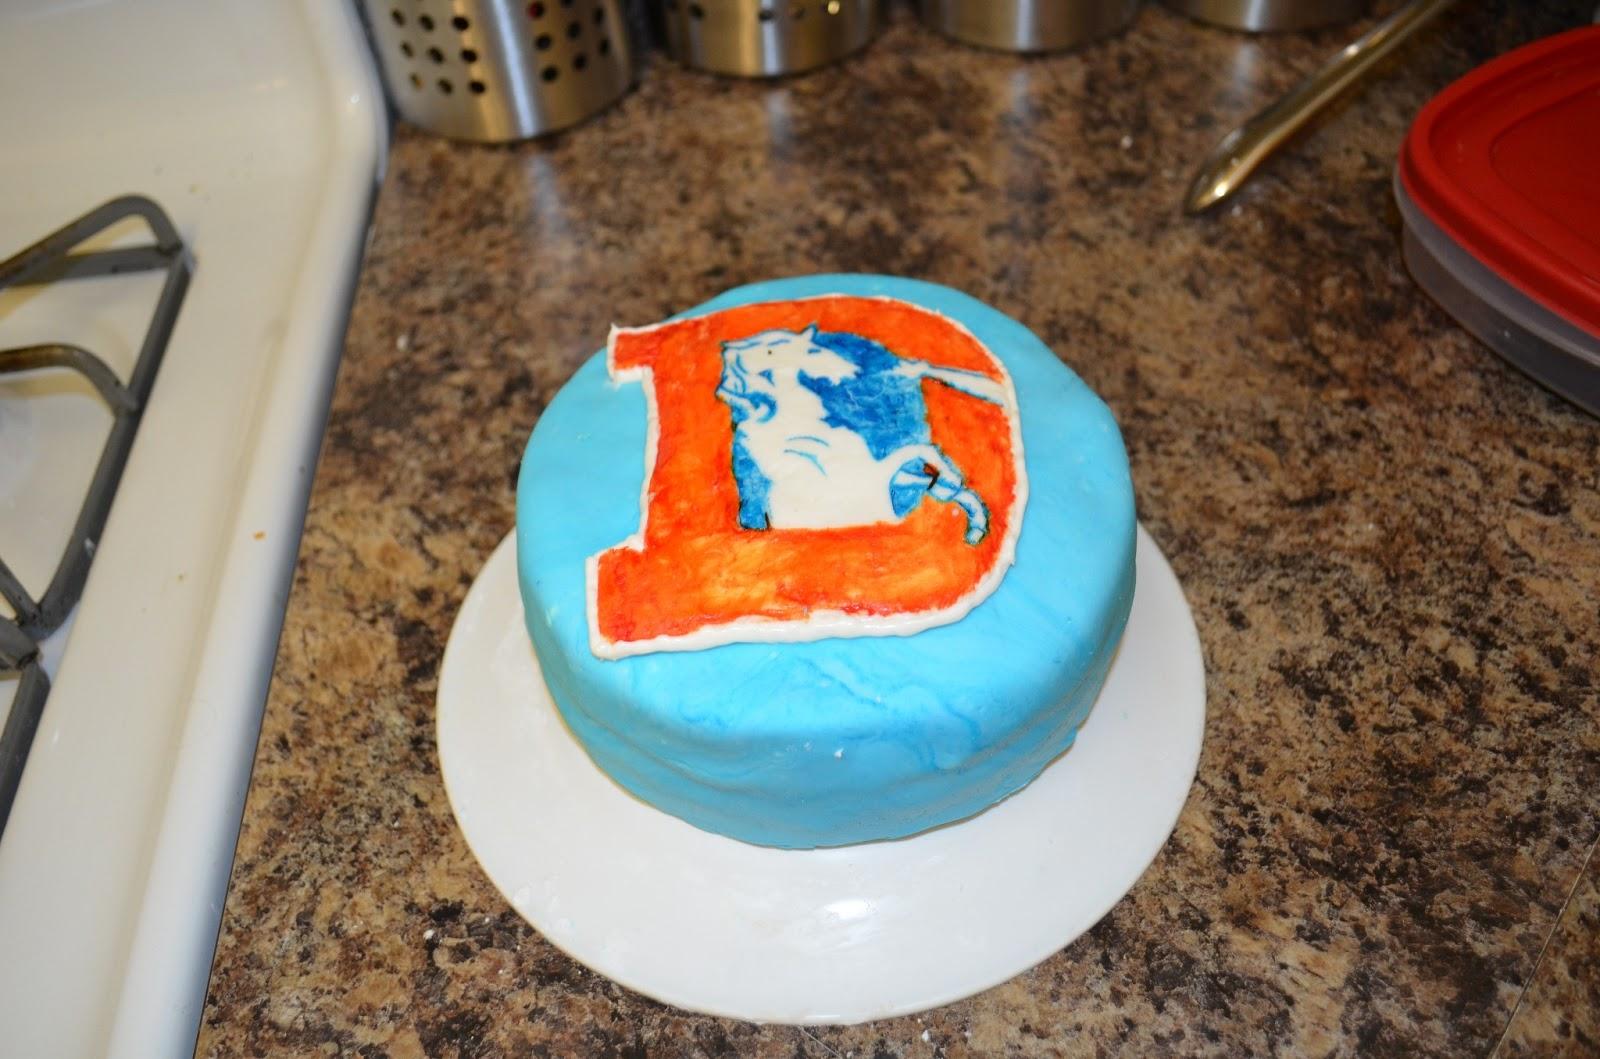 Sarahs Baked Goods Denver Broncos Birthday Cake May 2013